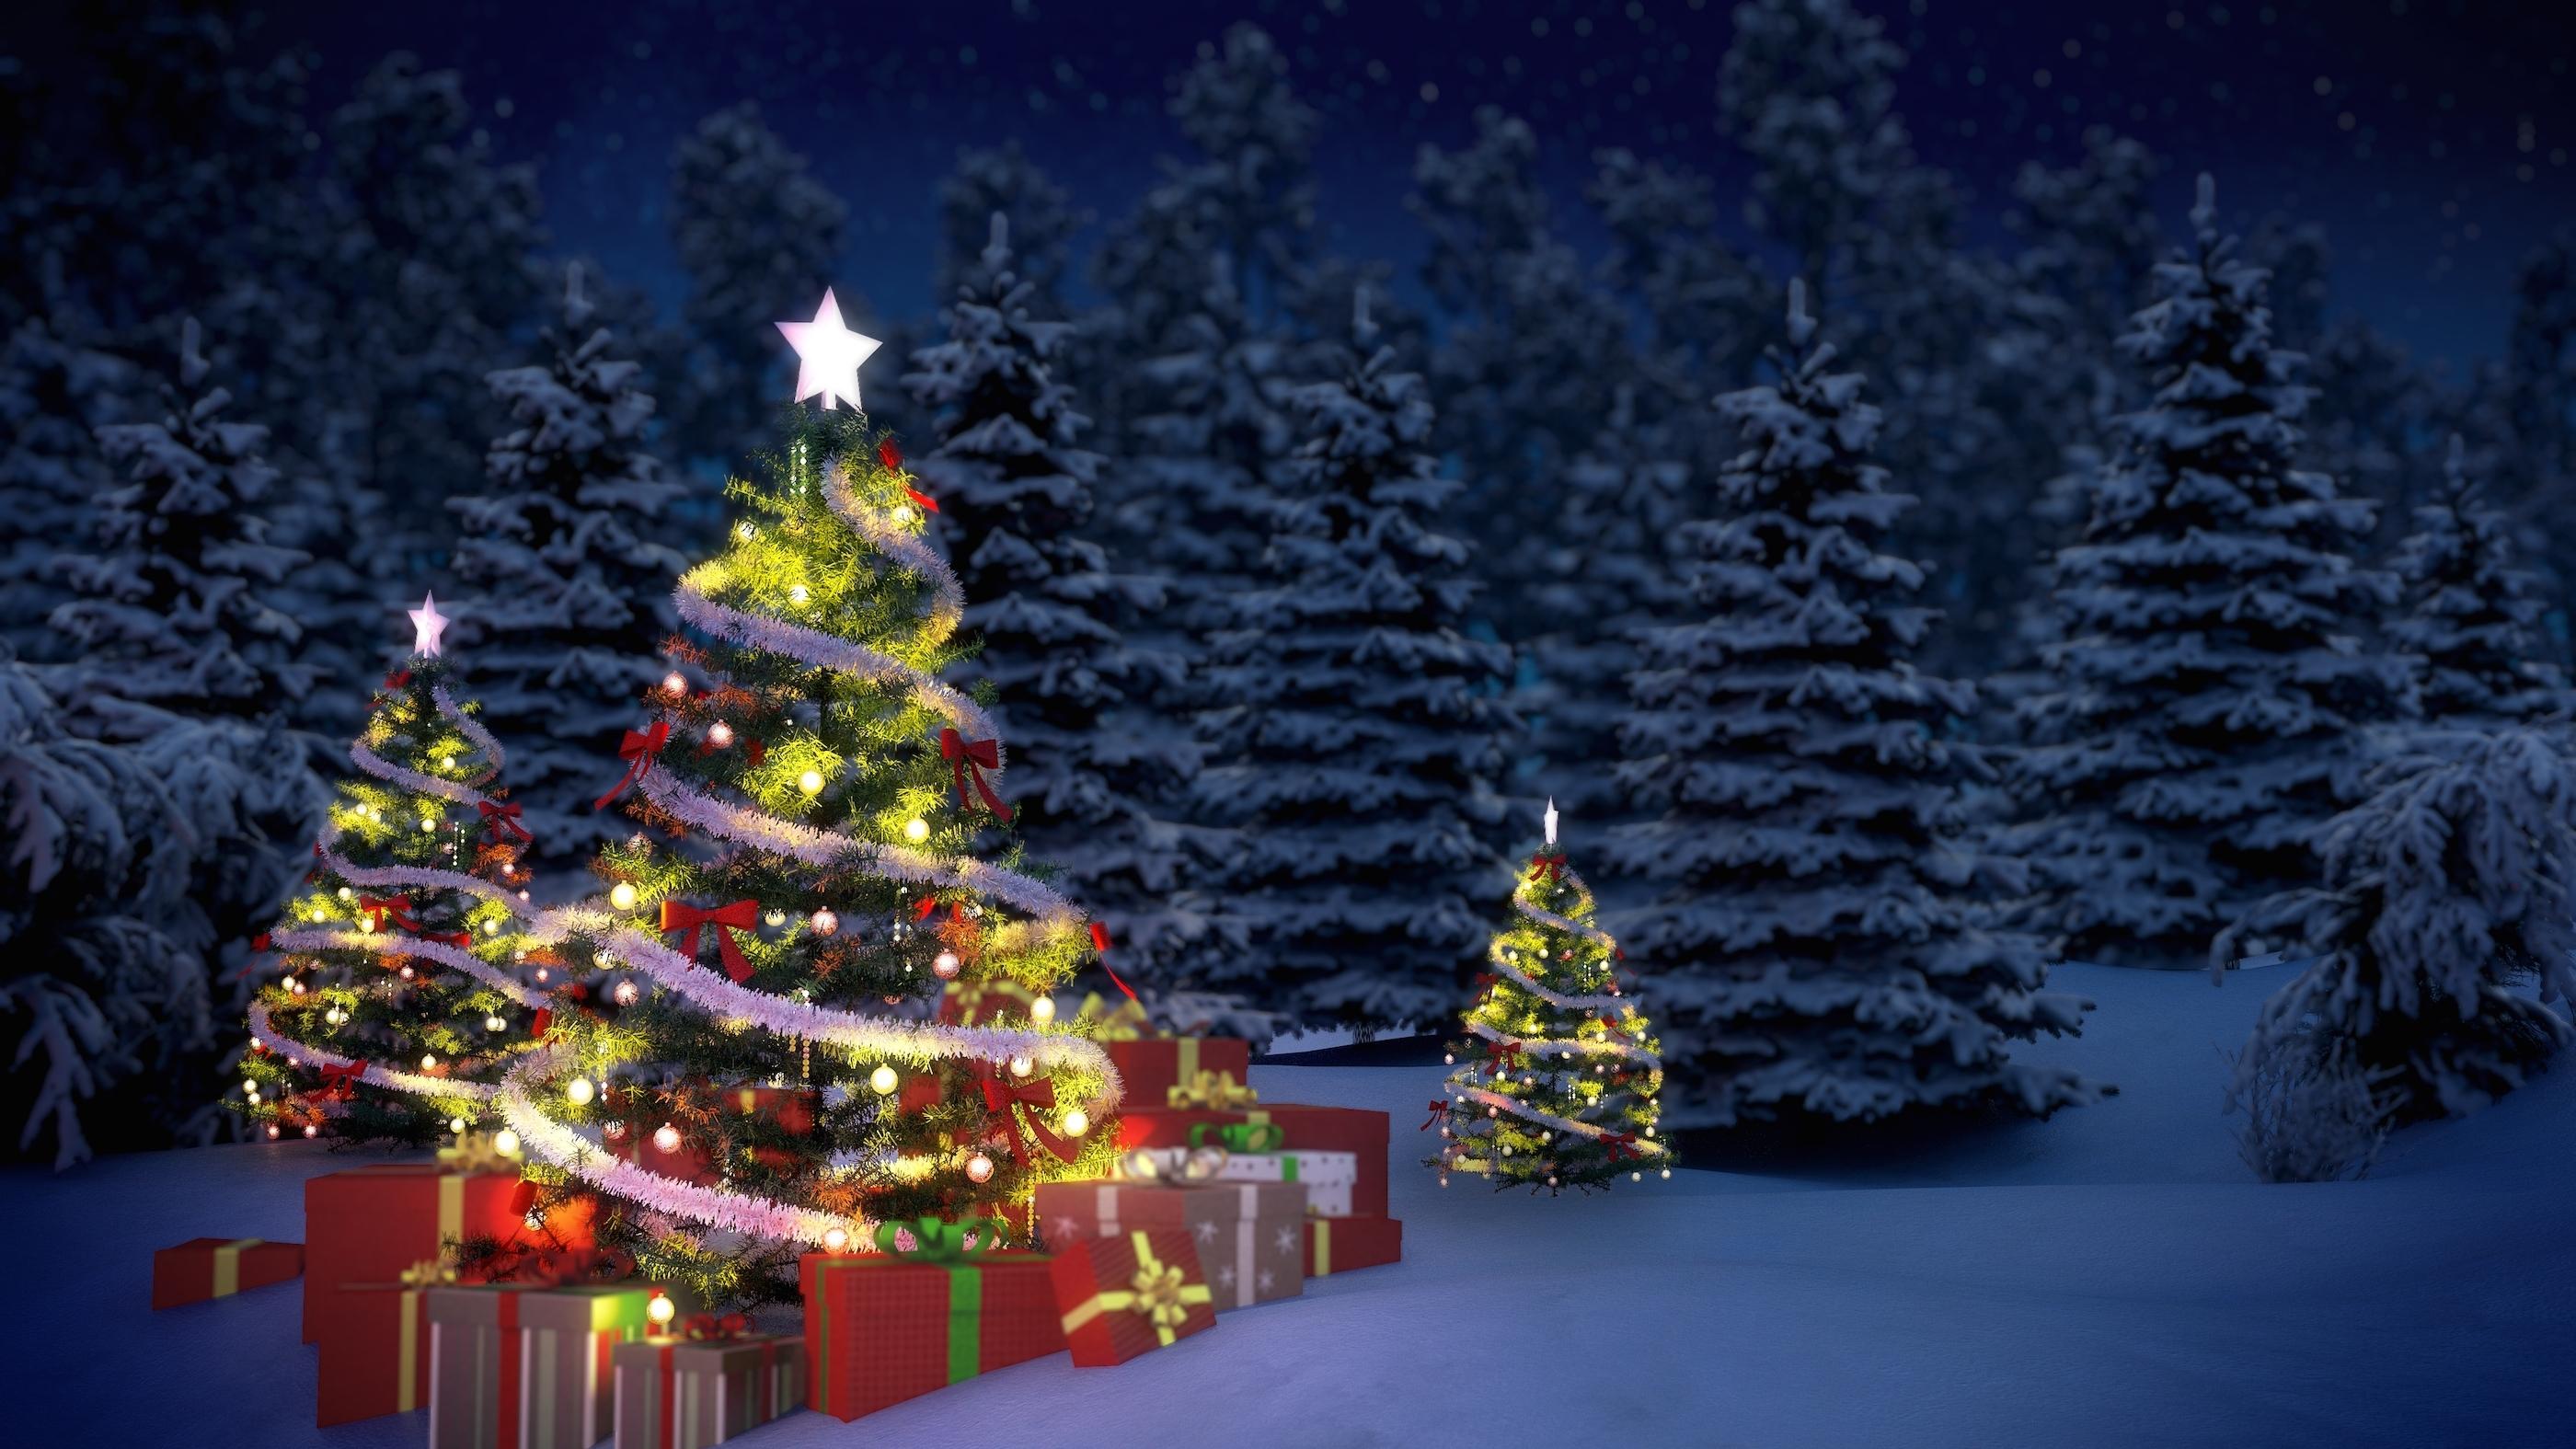 0b19d6f0ae05c5c184d1_647c17c70de59079263c_Christmas_11.jpg